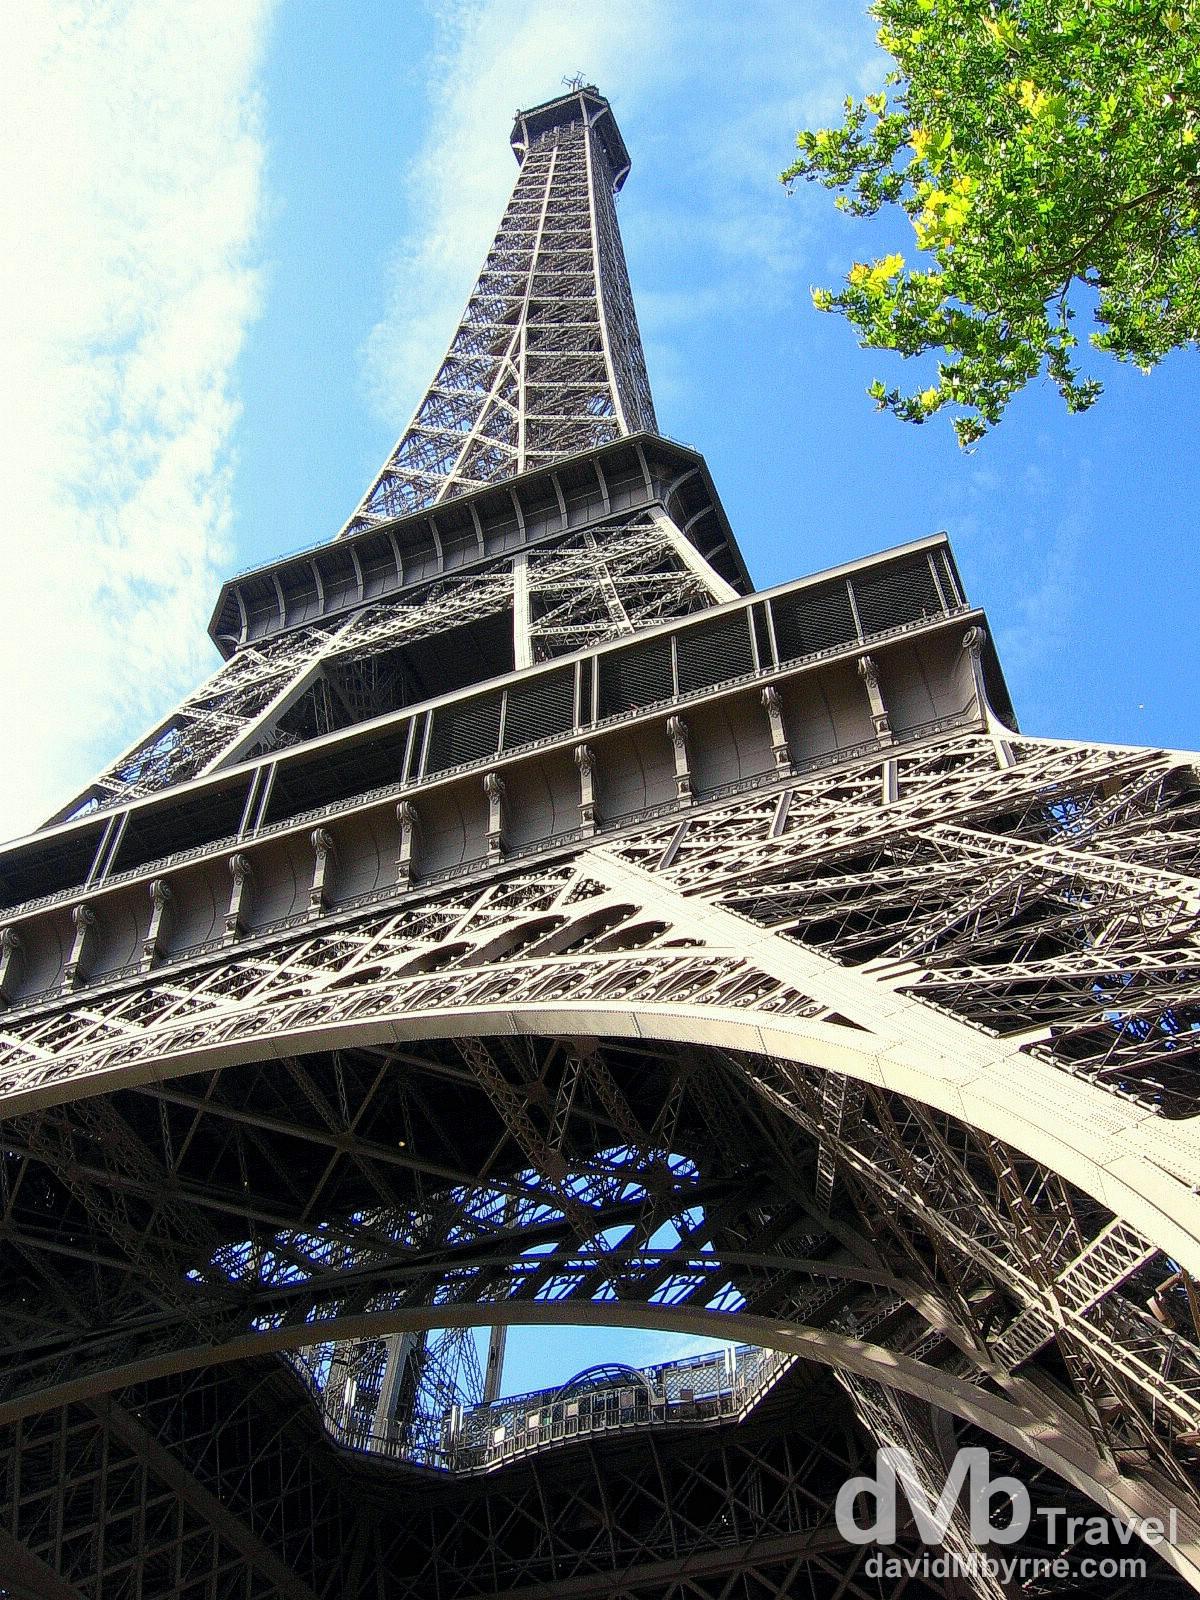 The Eiffel Tower, Paris, France. August 18th, 2007.